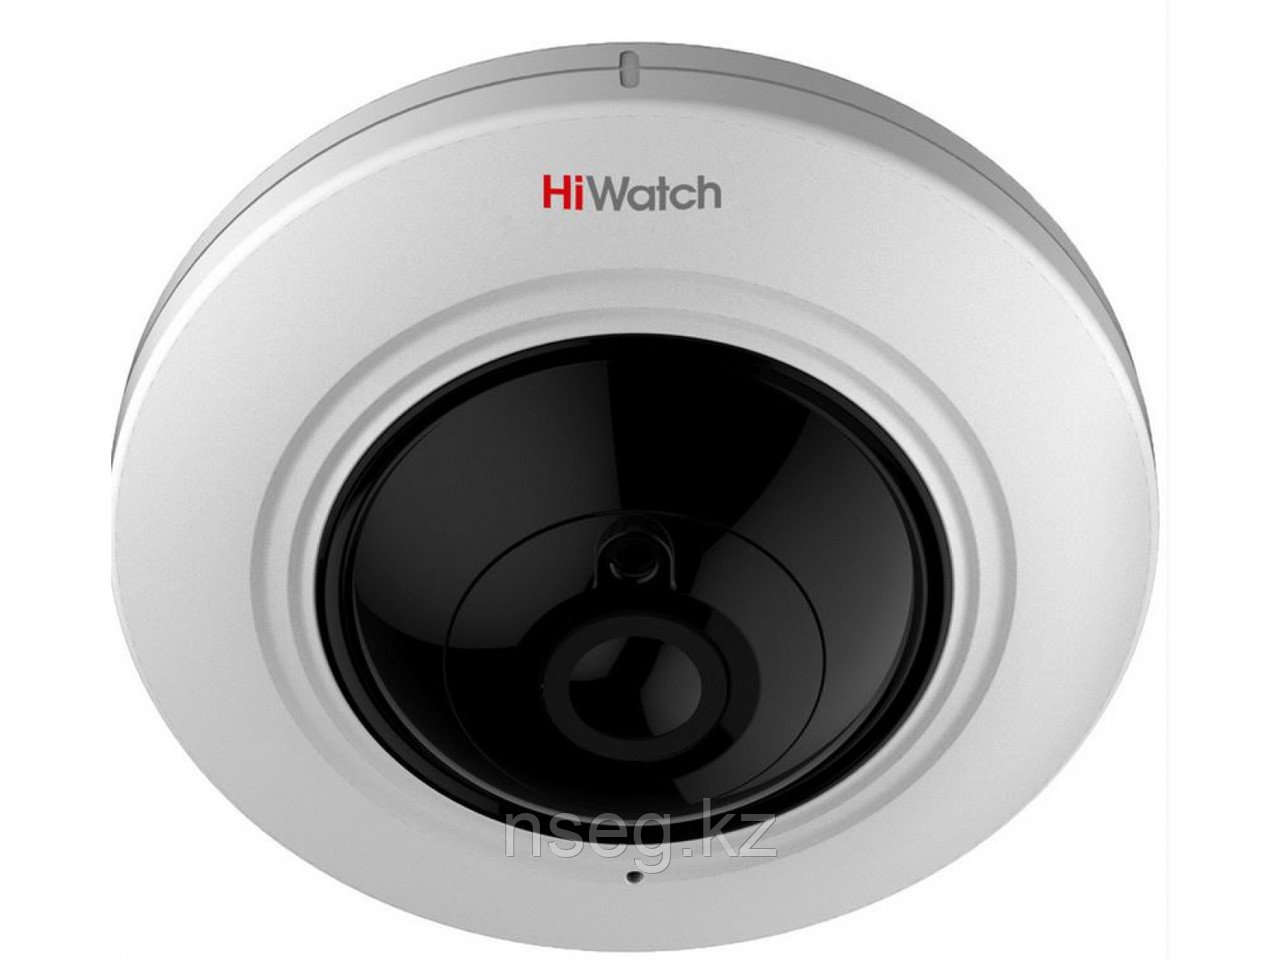 HiWatch DS-T501(1.1mm) 5Мп фишай HD-TVI камера с EXIR до 20м